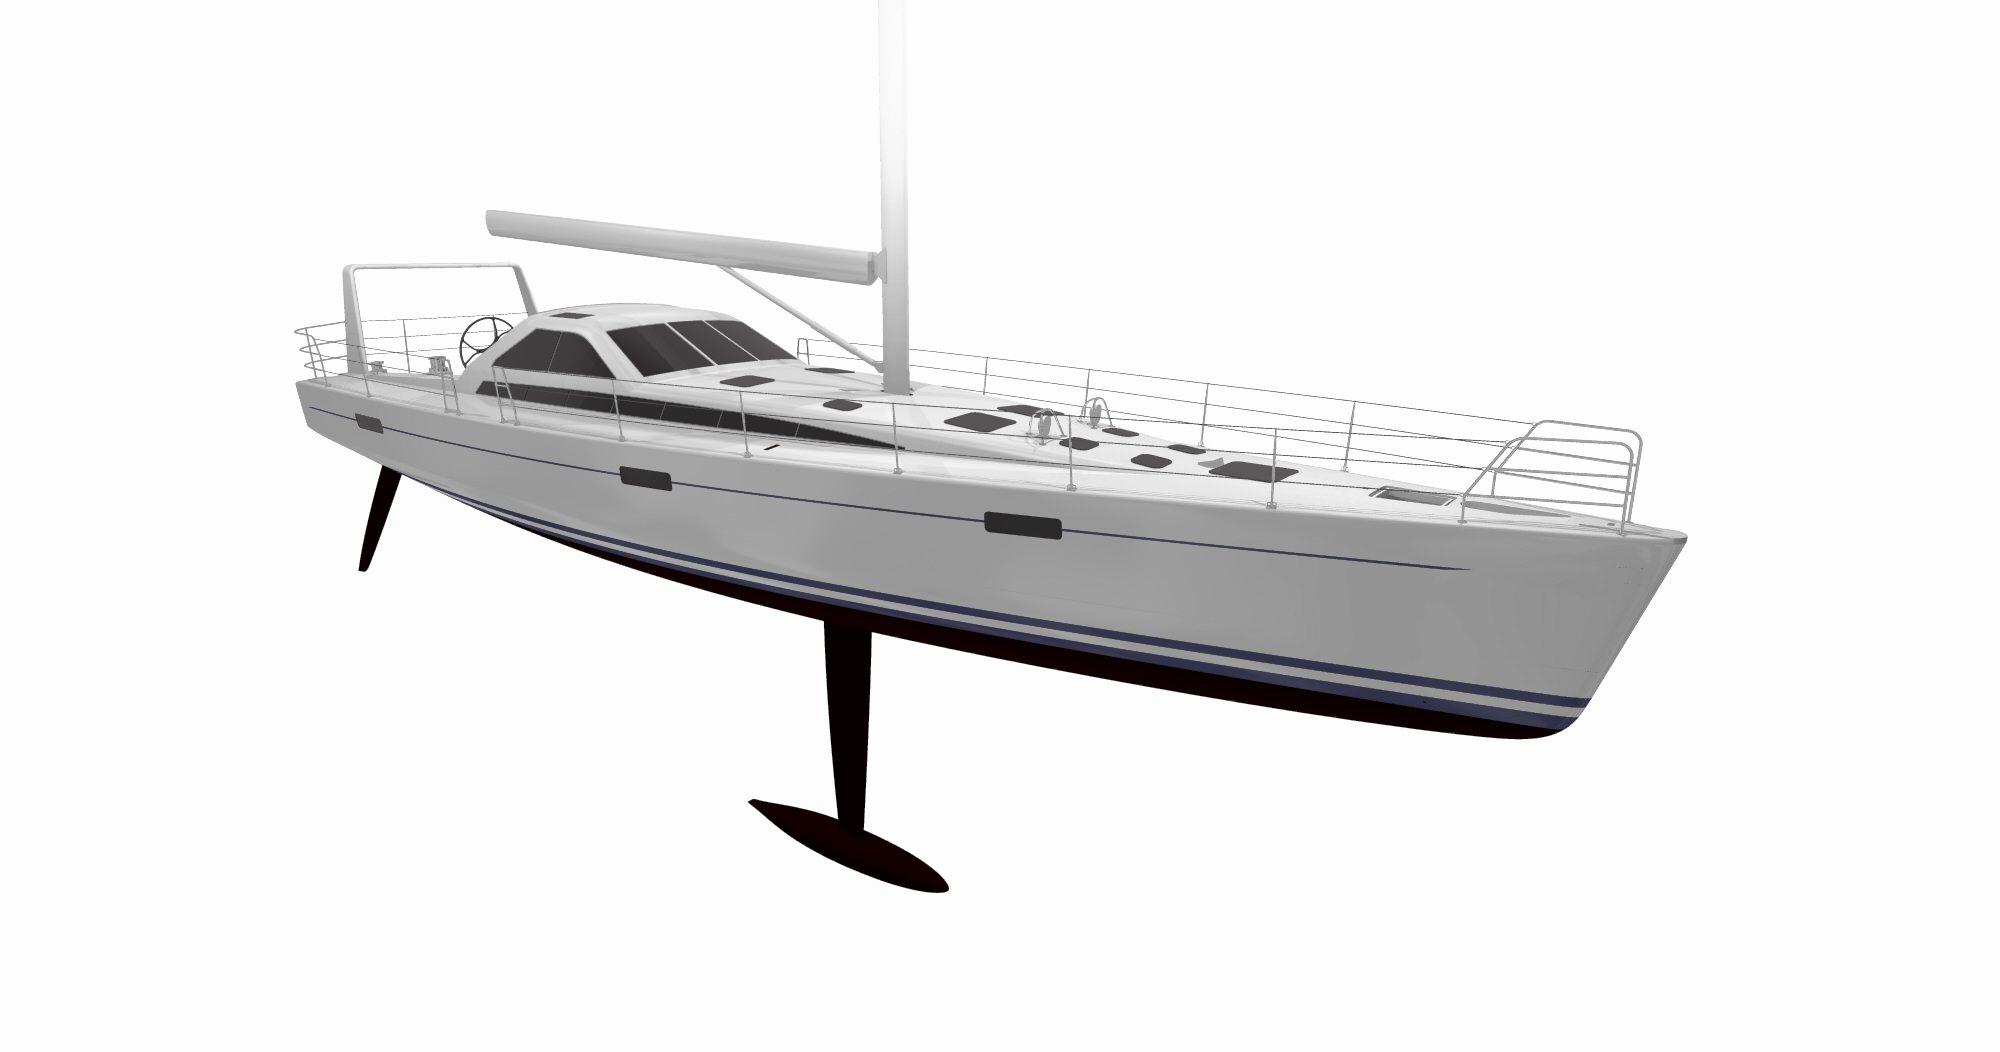 LM Farr 63 Racing-Sailing Yacht, Kiwi Spirit